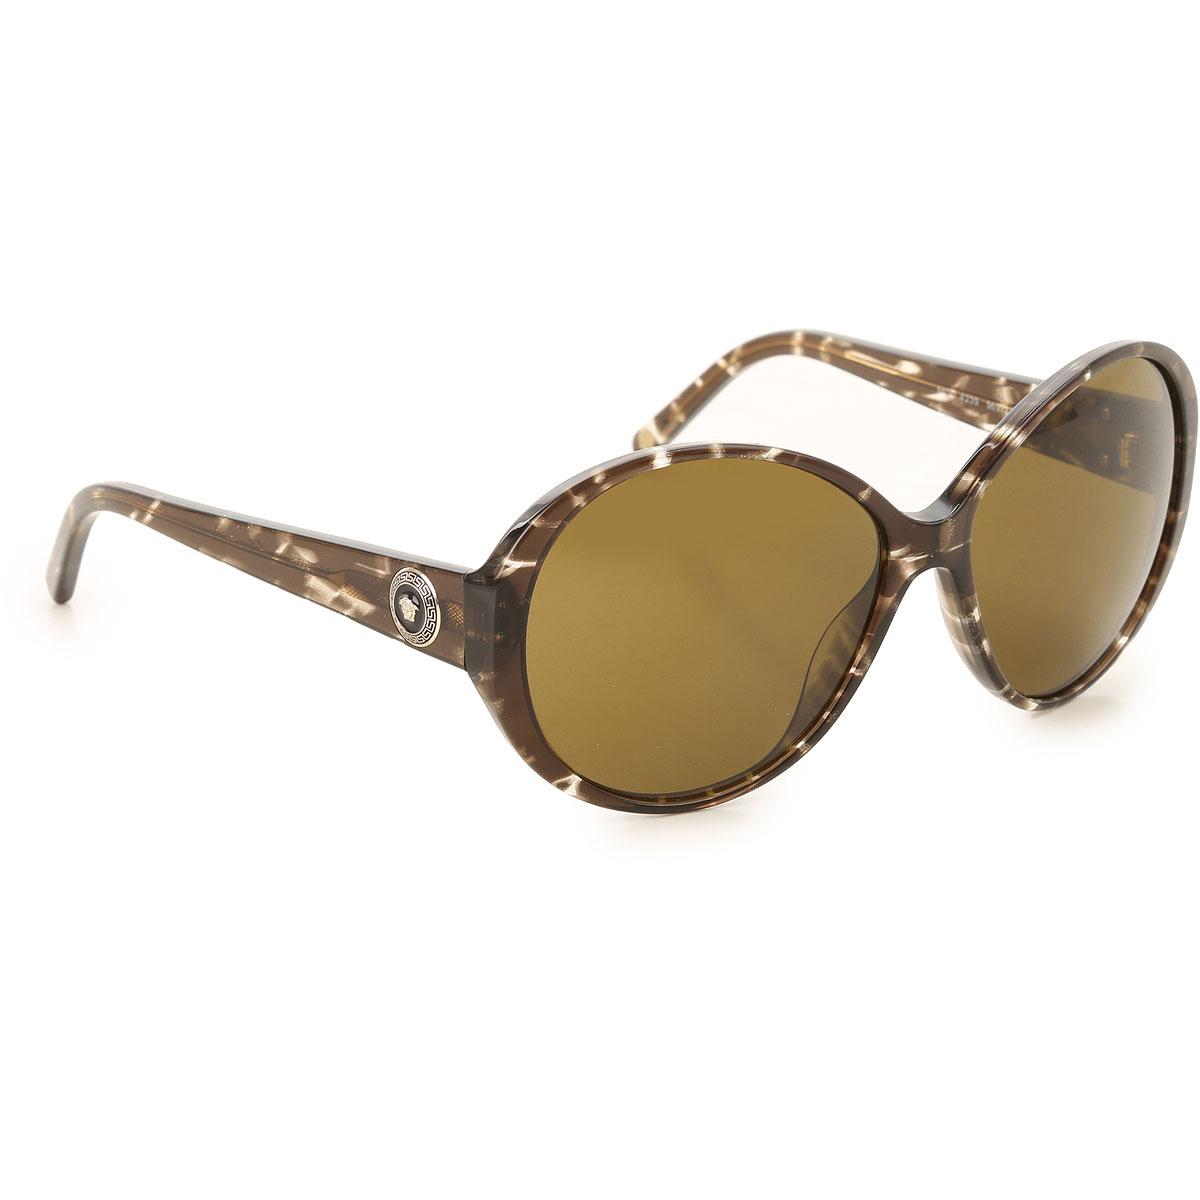 Gianni Versace Sunglasses On Sale, Grey, 2019